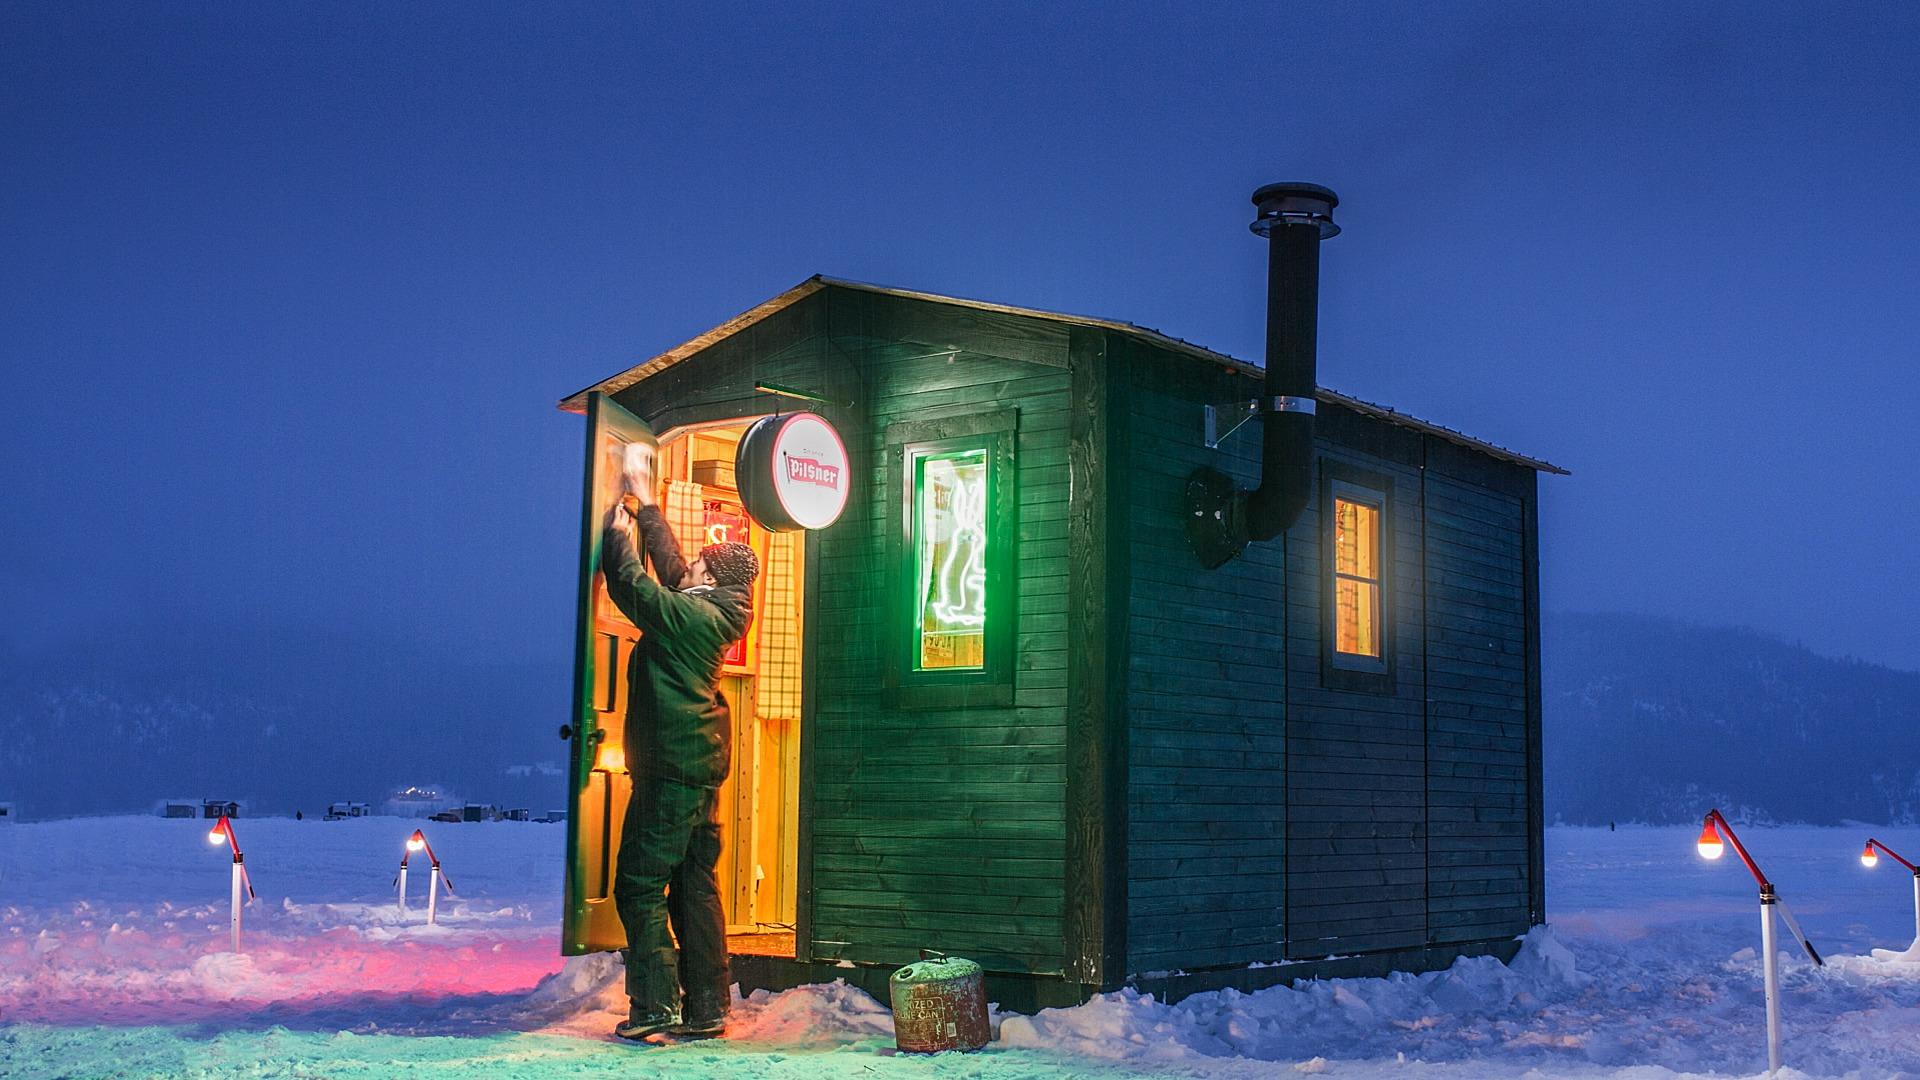 The ice fishing shack bar rethink canada for Ice fishing shacks